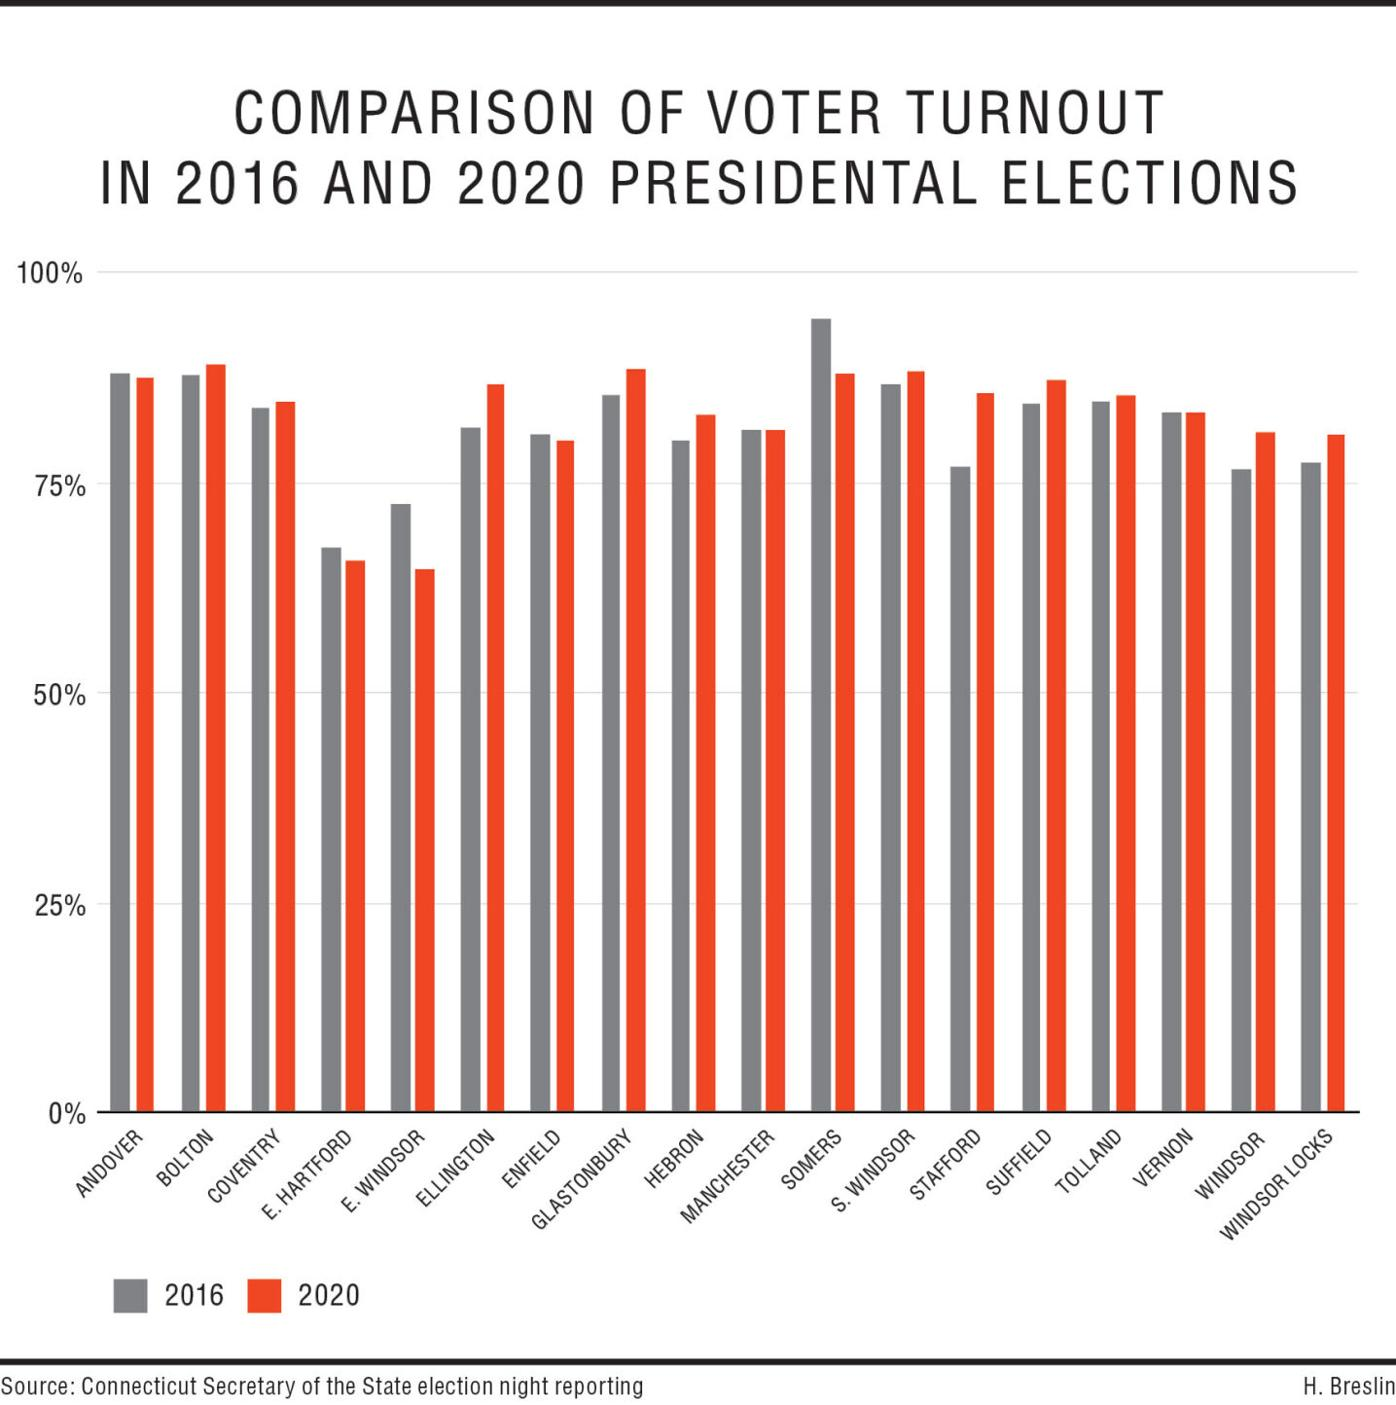 Presidential voter turnout 2016 vs 2020